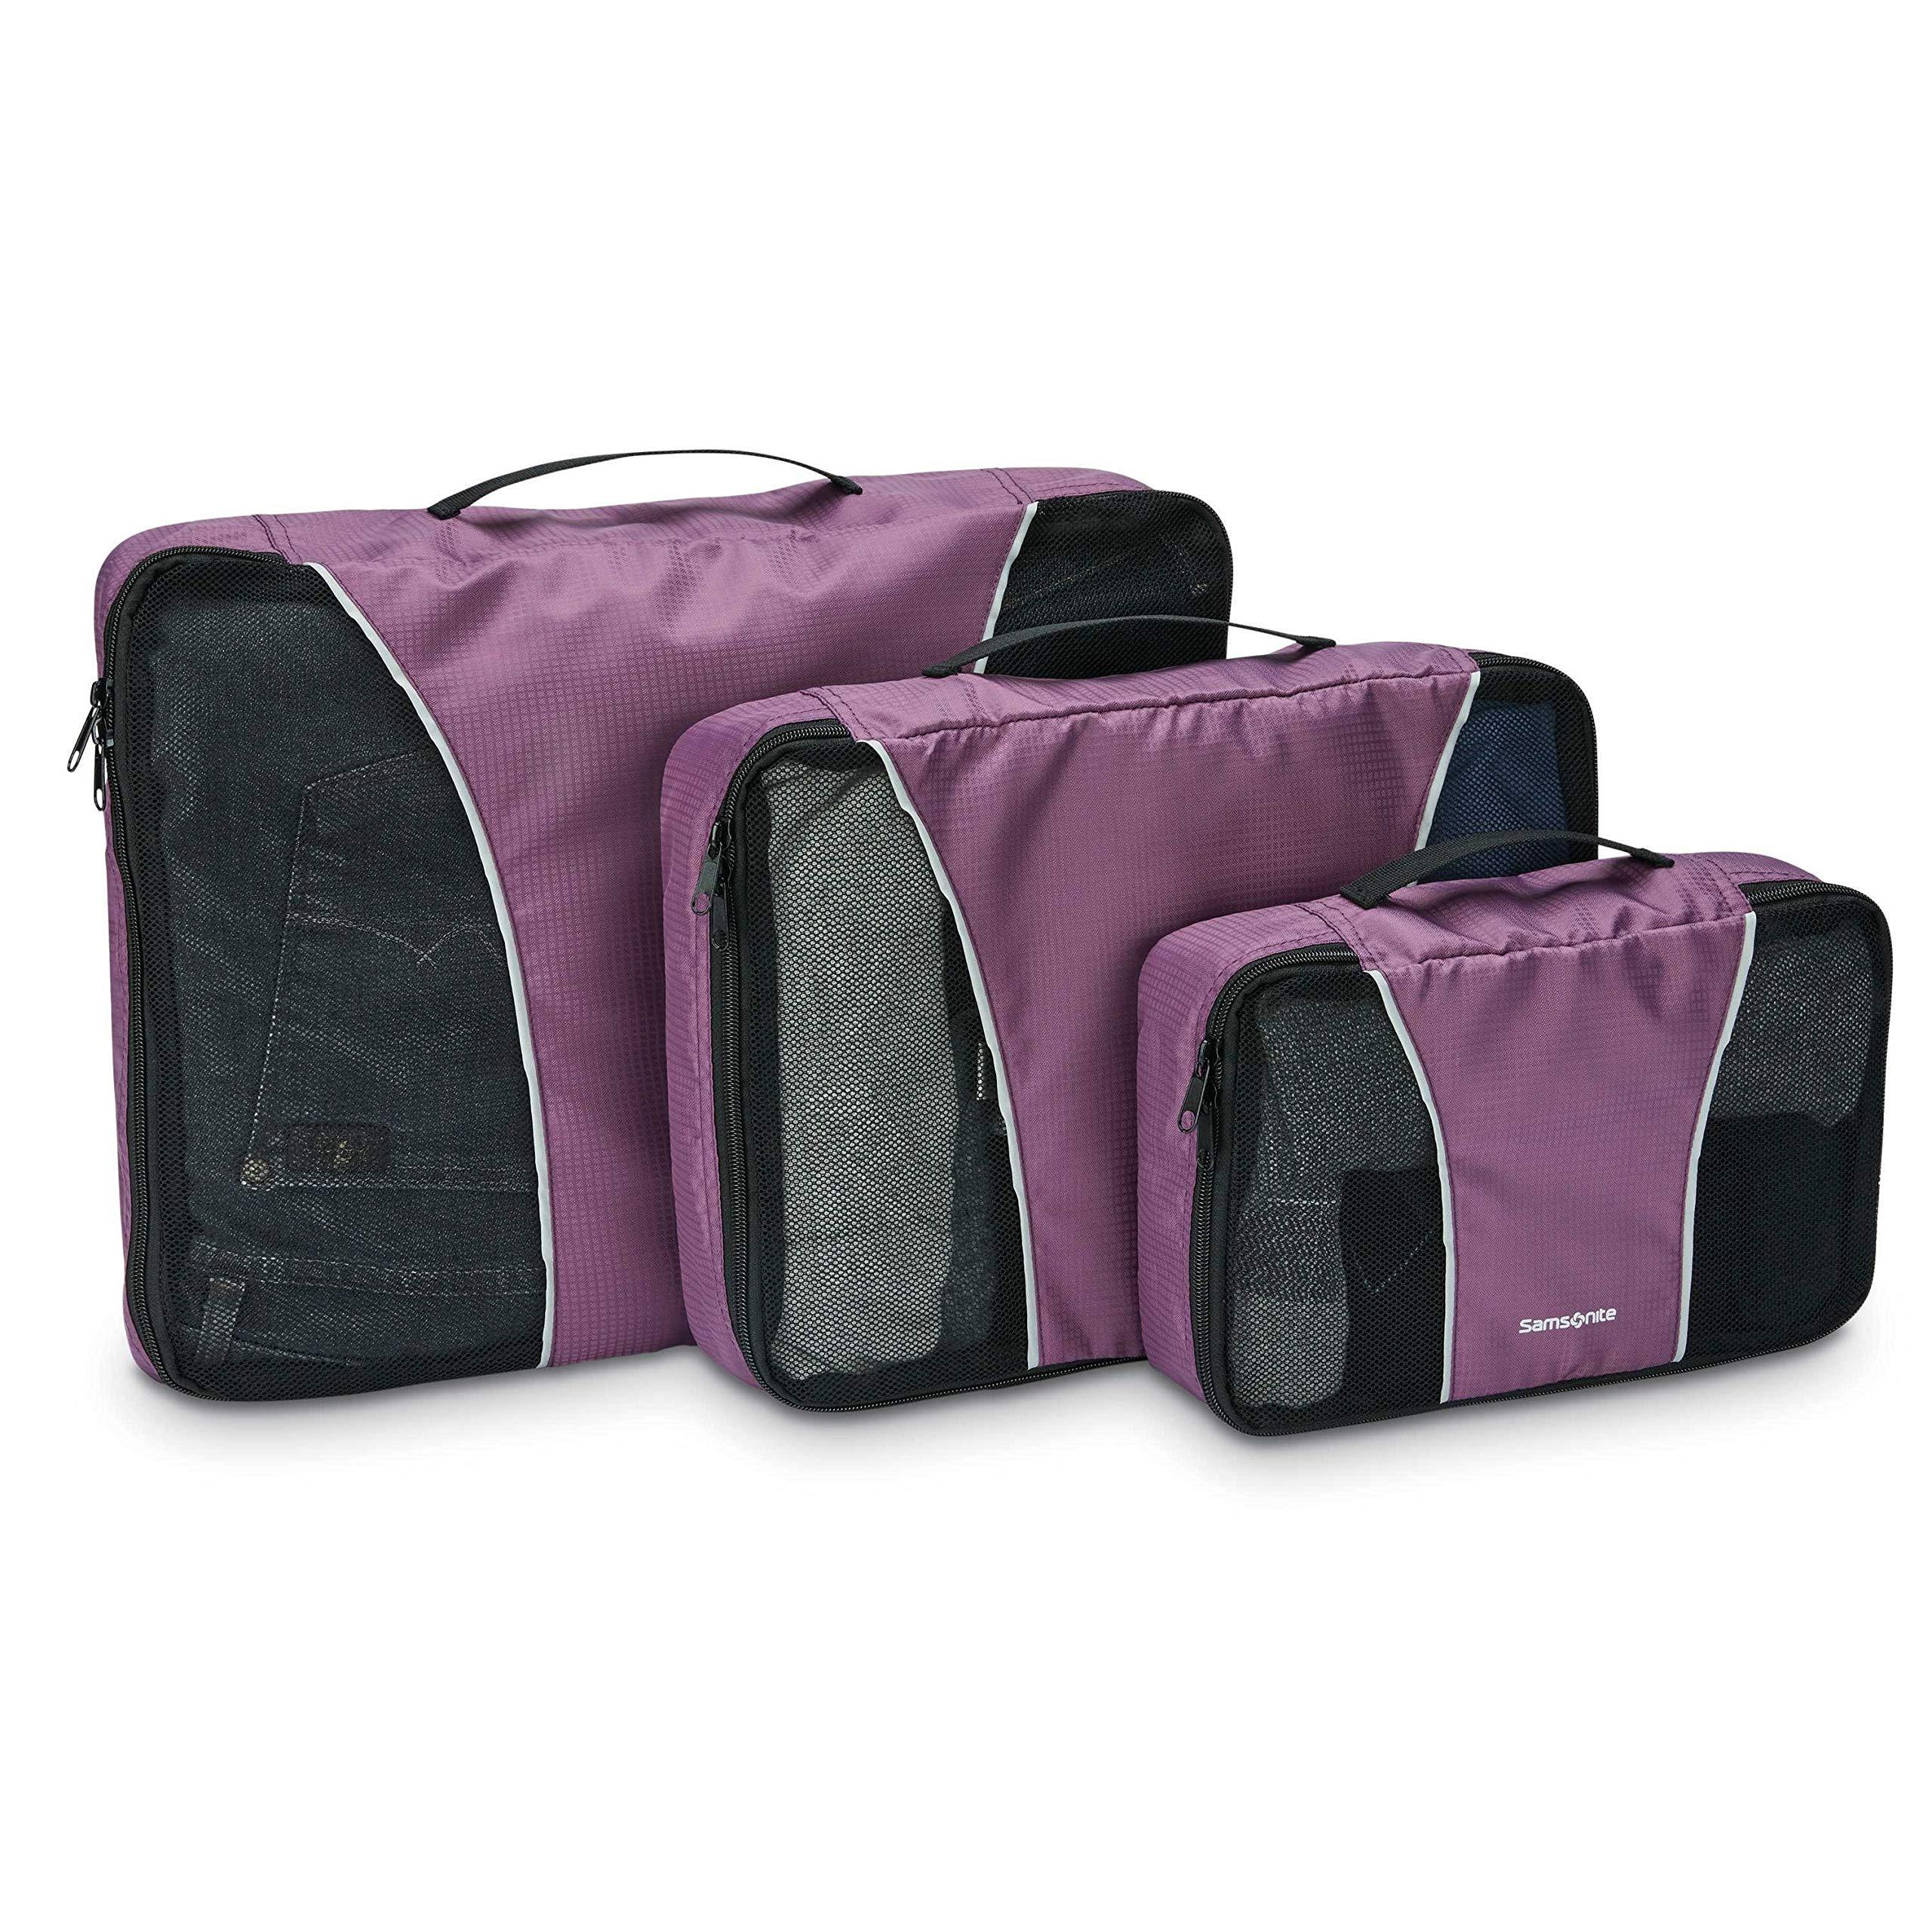 Samsonite 3 Piece Packing Cube Set Travel Tote, Purple, One Size by Samsonite